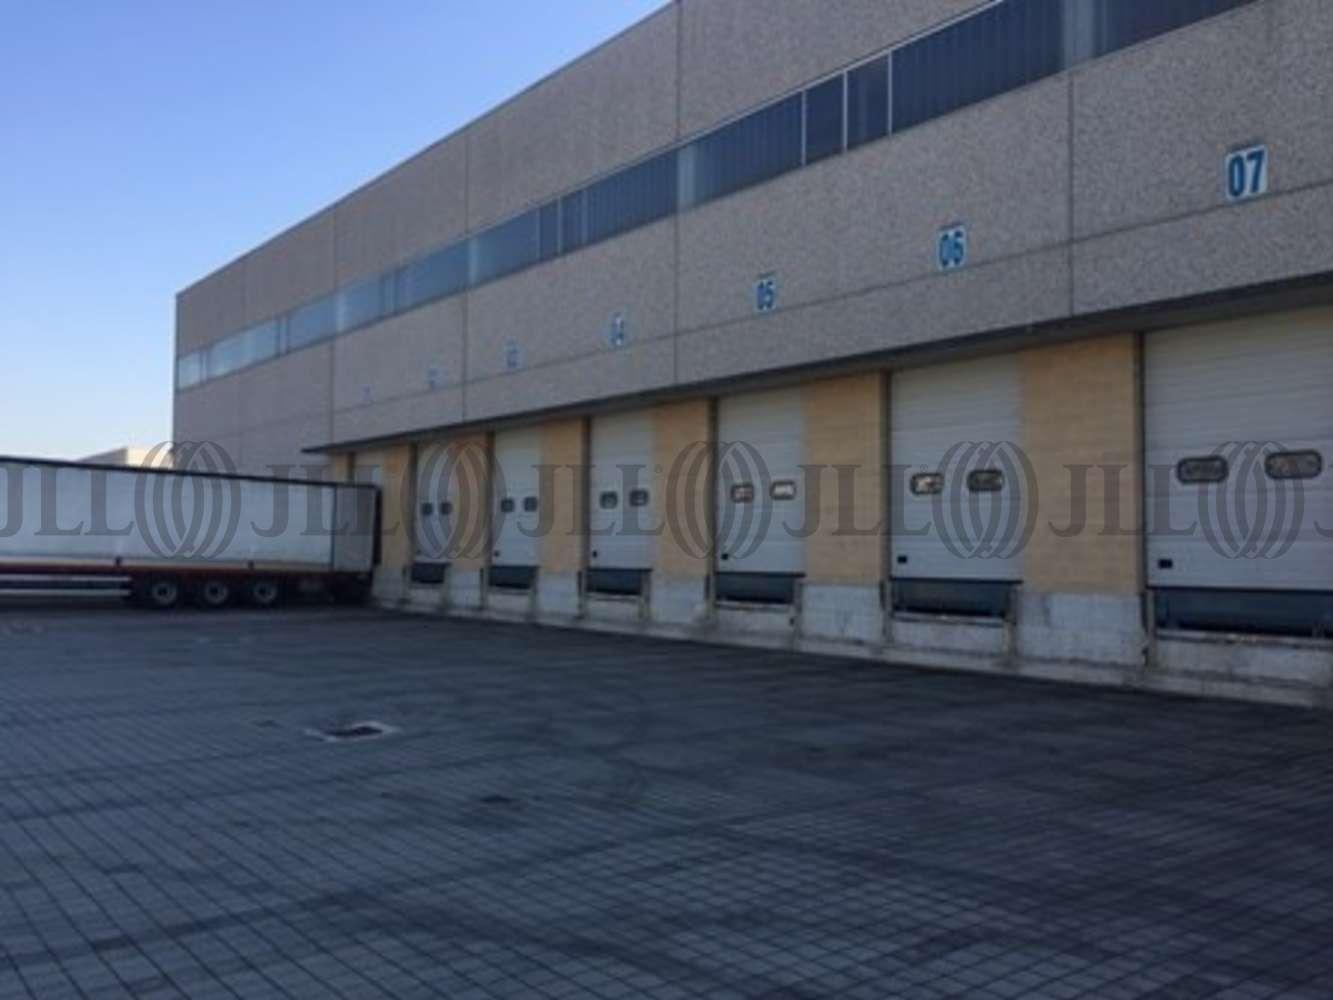 Magazzini industriali e logistici Telgate, 24060 - Telgate Warehouse